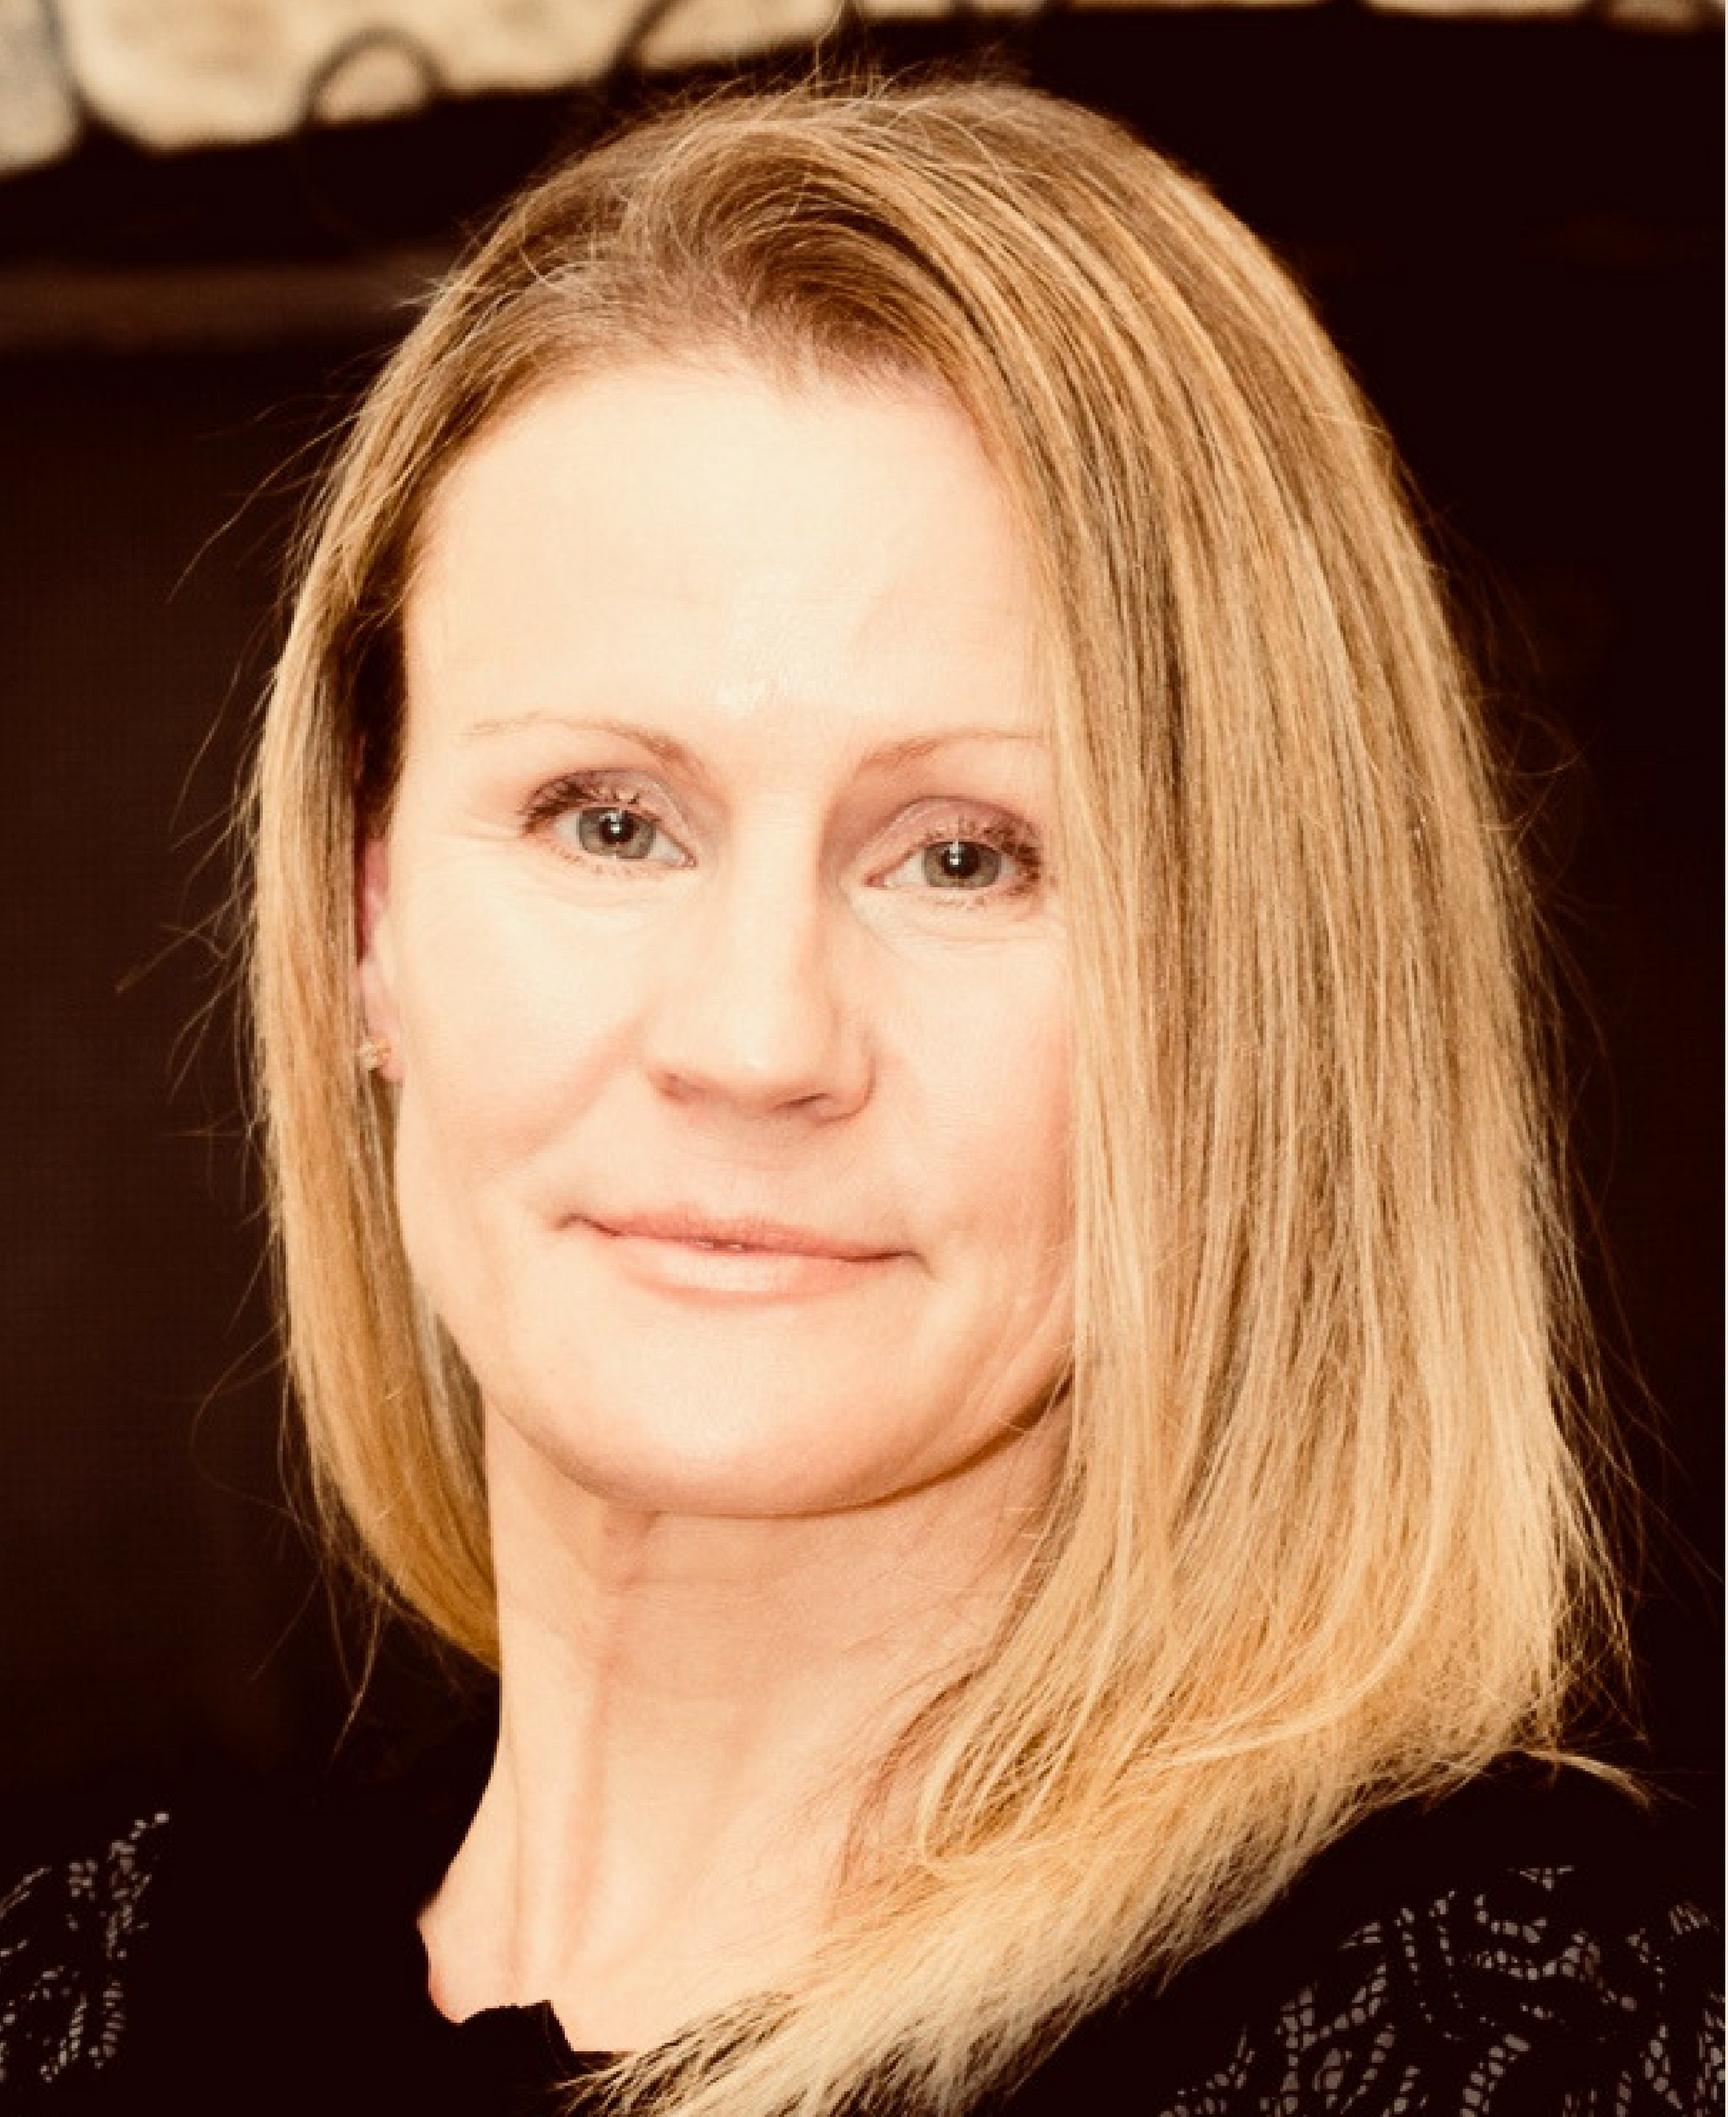 Heather Dixon, Professional Certified Hypnotist